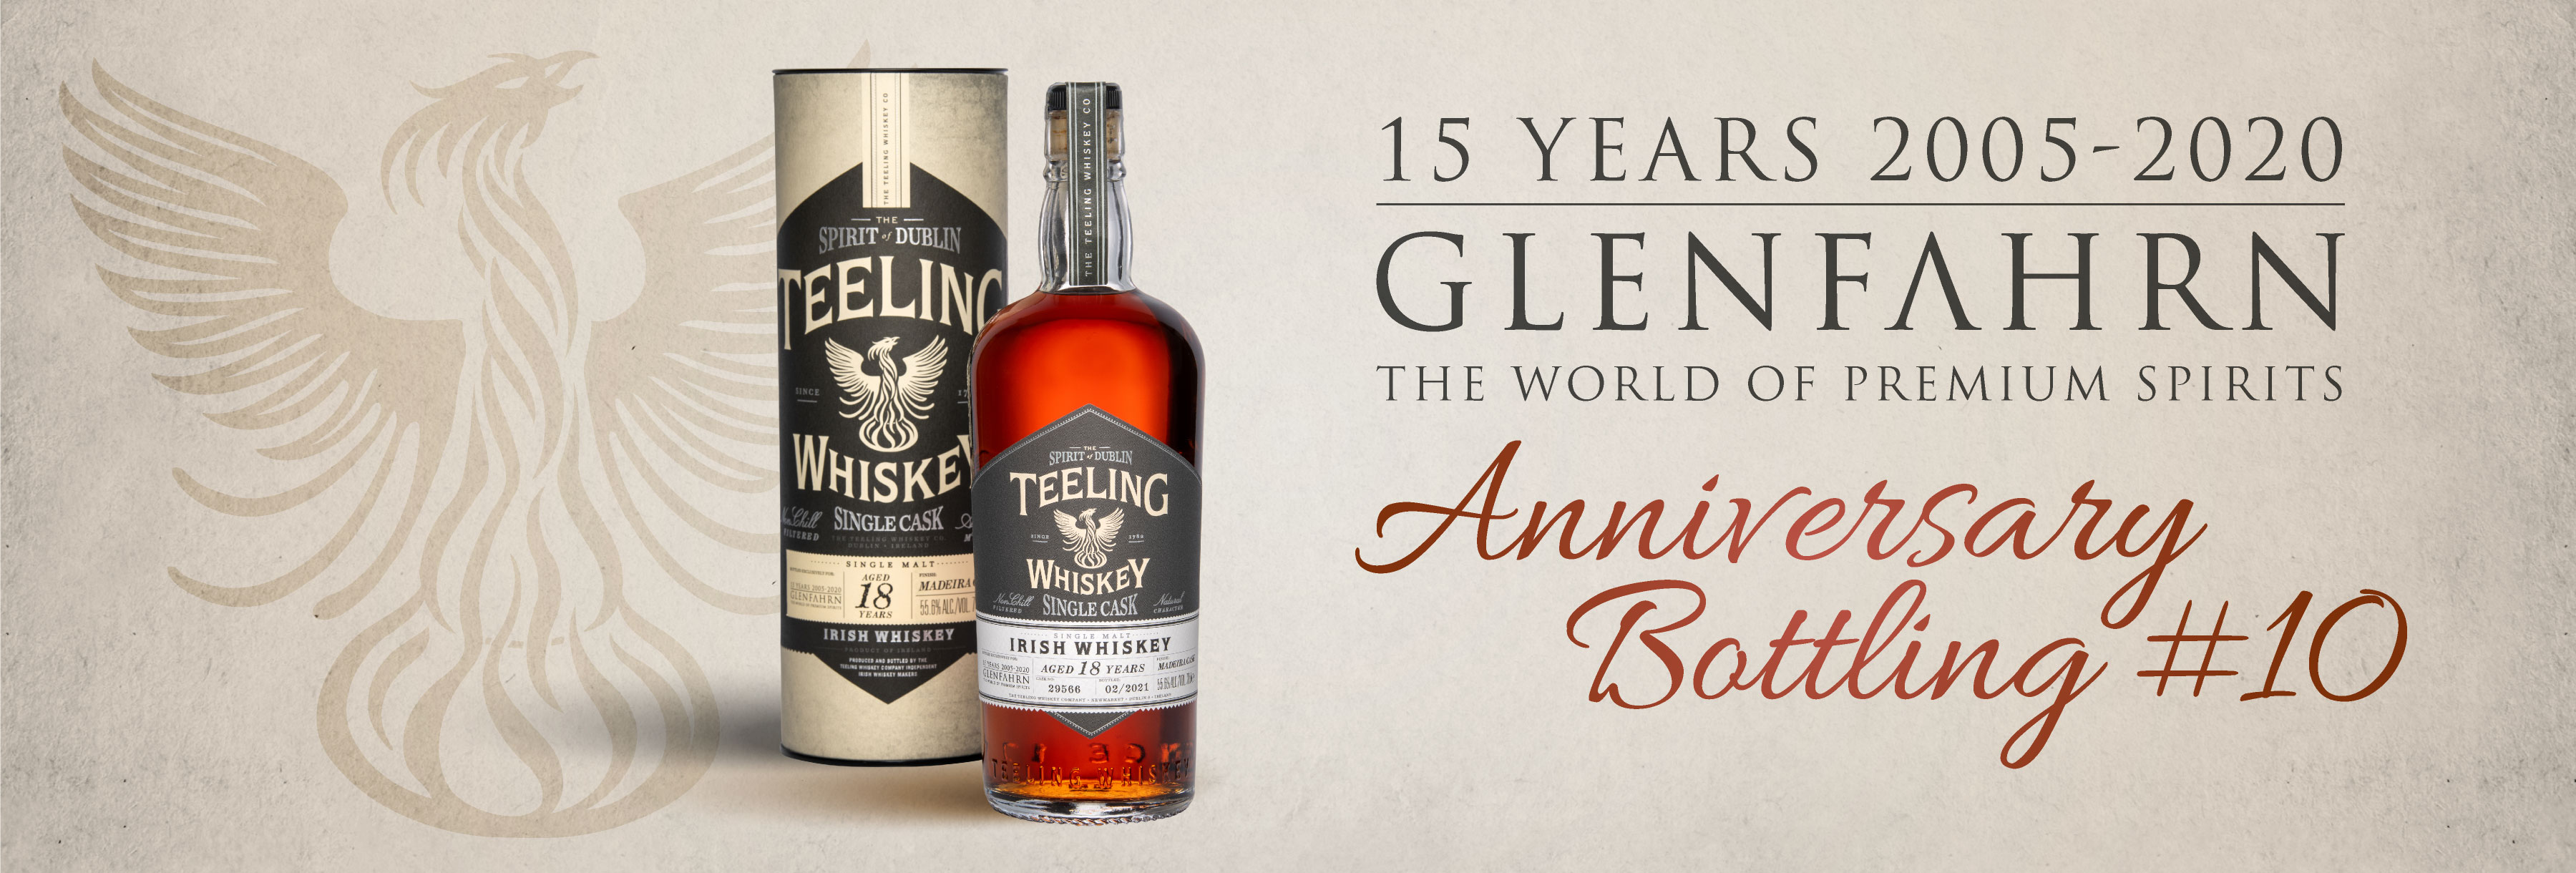 Teeling 18 Glen Fahrn Anniversary Jubiläum Whiskey Whisky Rar Selten Single Cask Einzelfass Geschenk